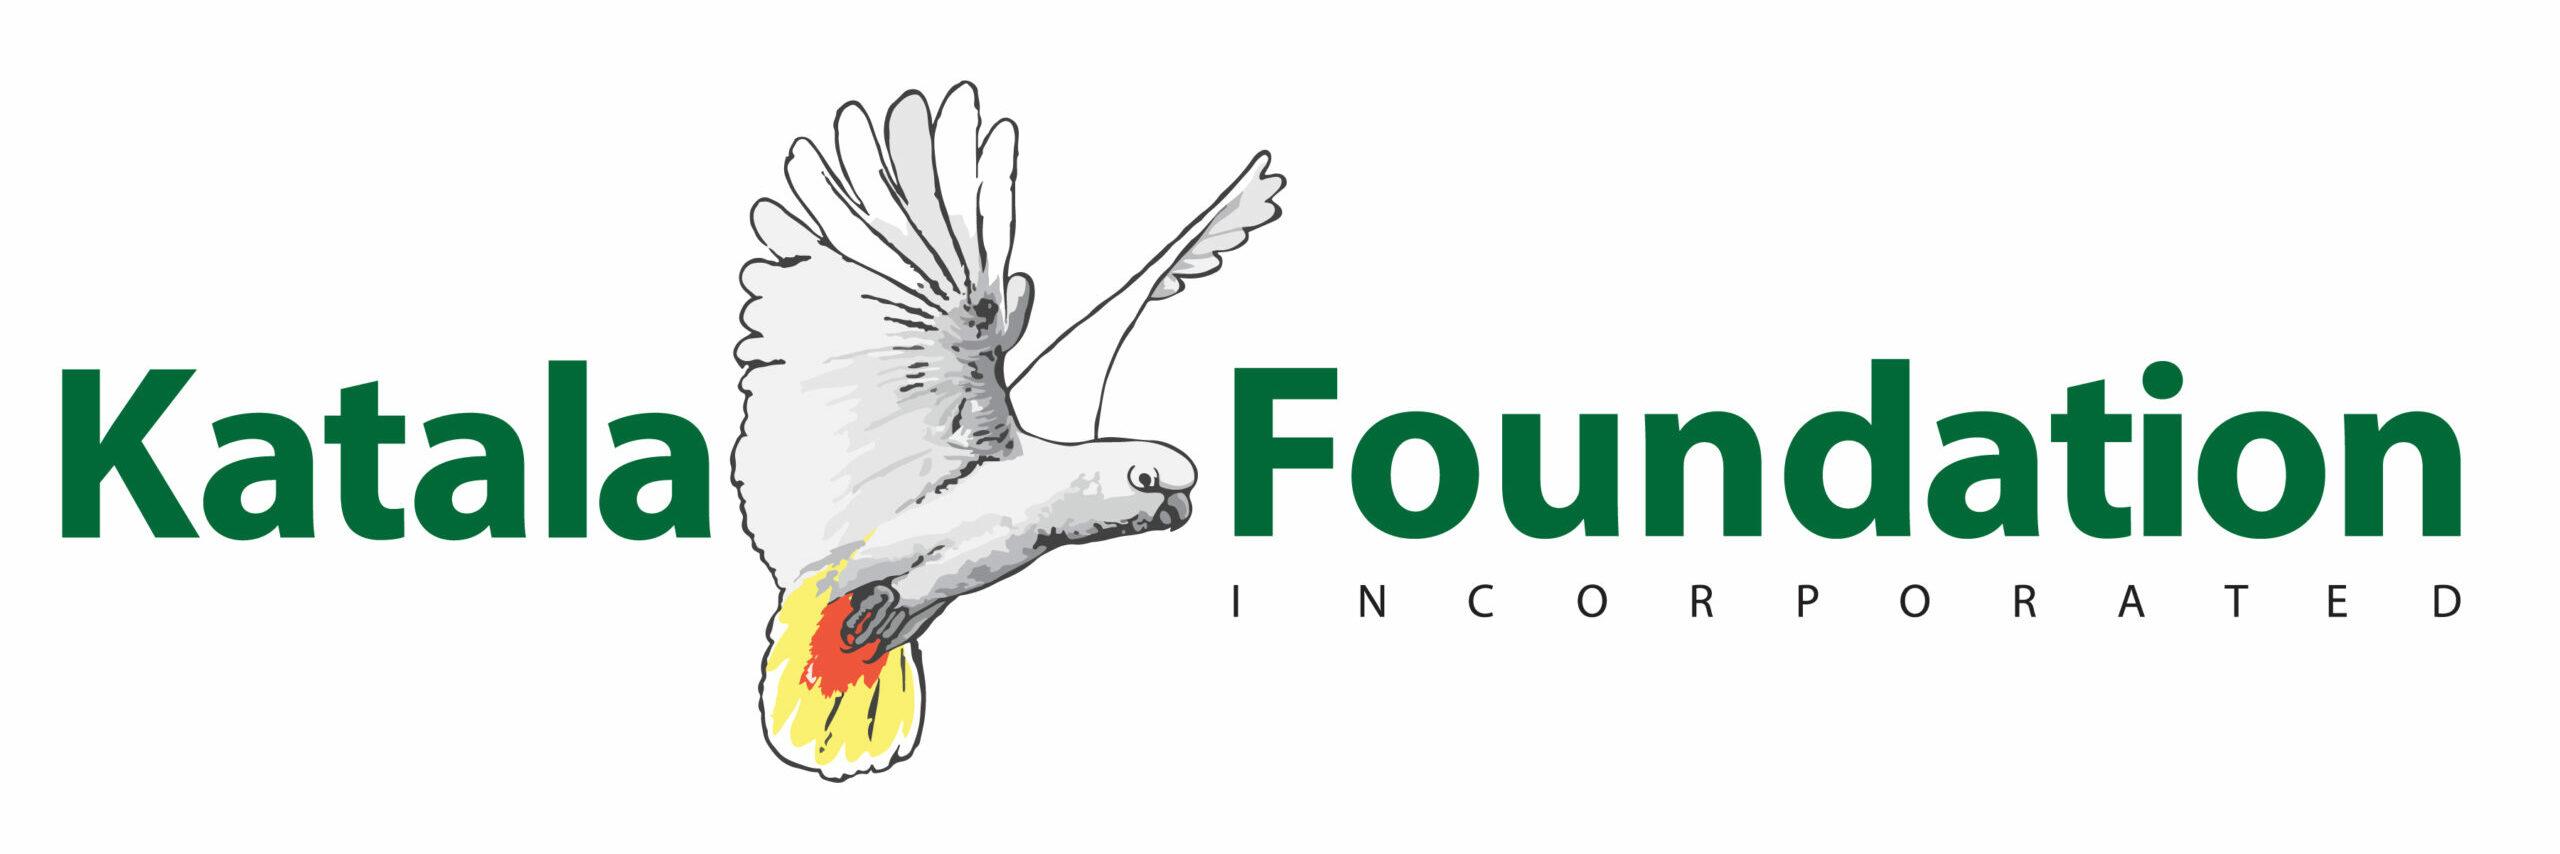 cropped-KFI-Logo-HORIZONTALFINAL-2-scaled-2.jpg